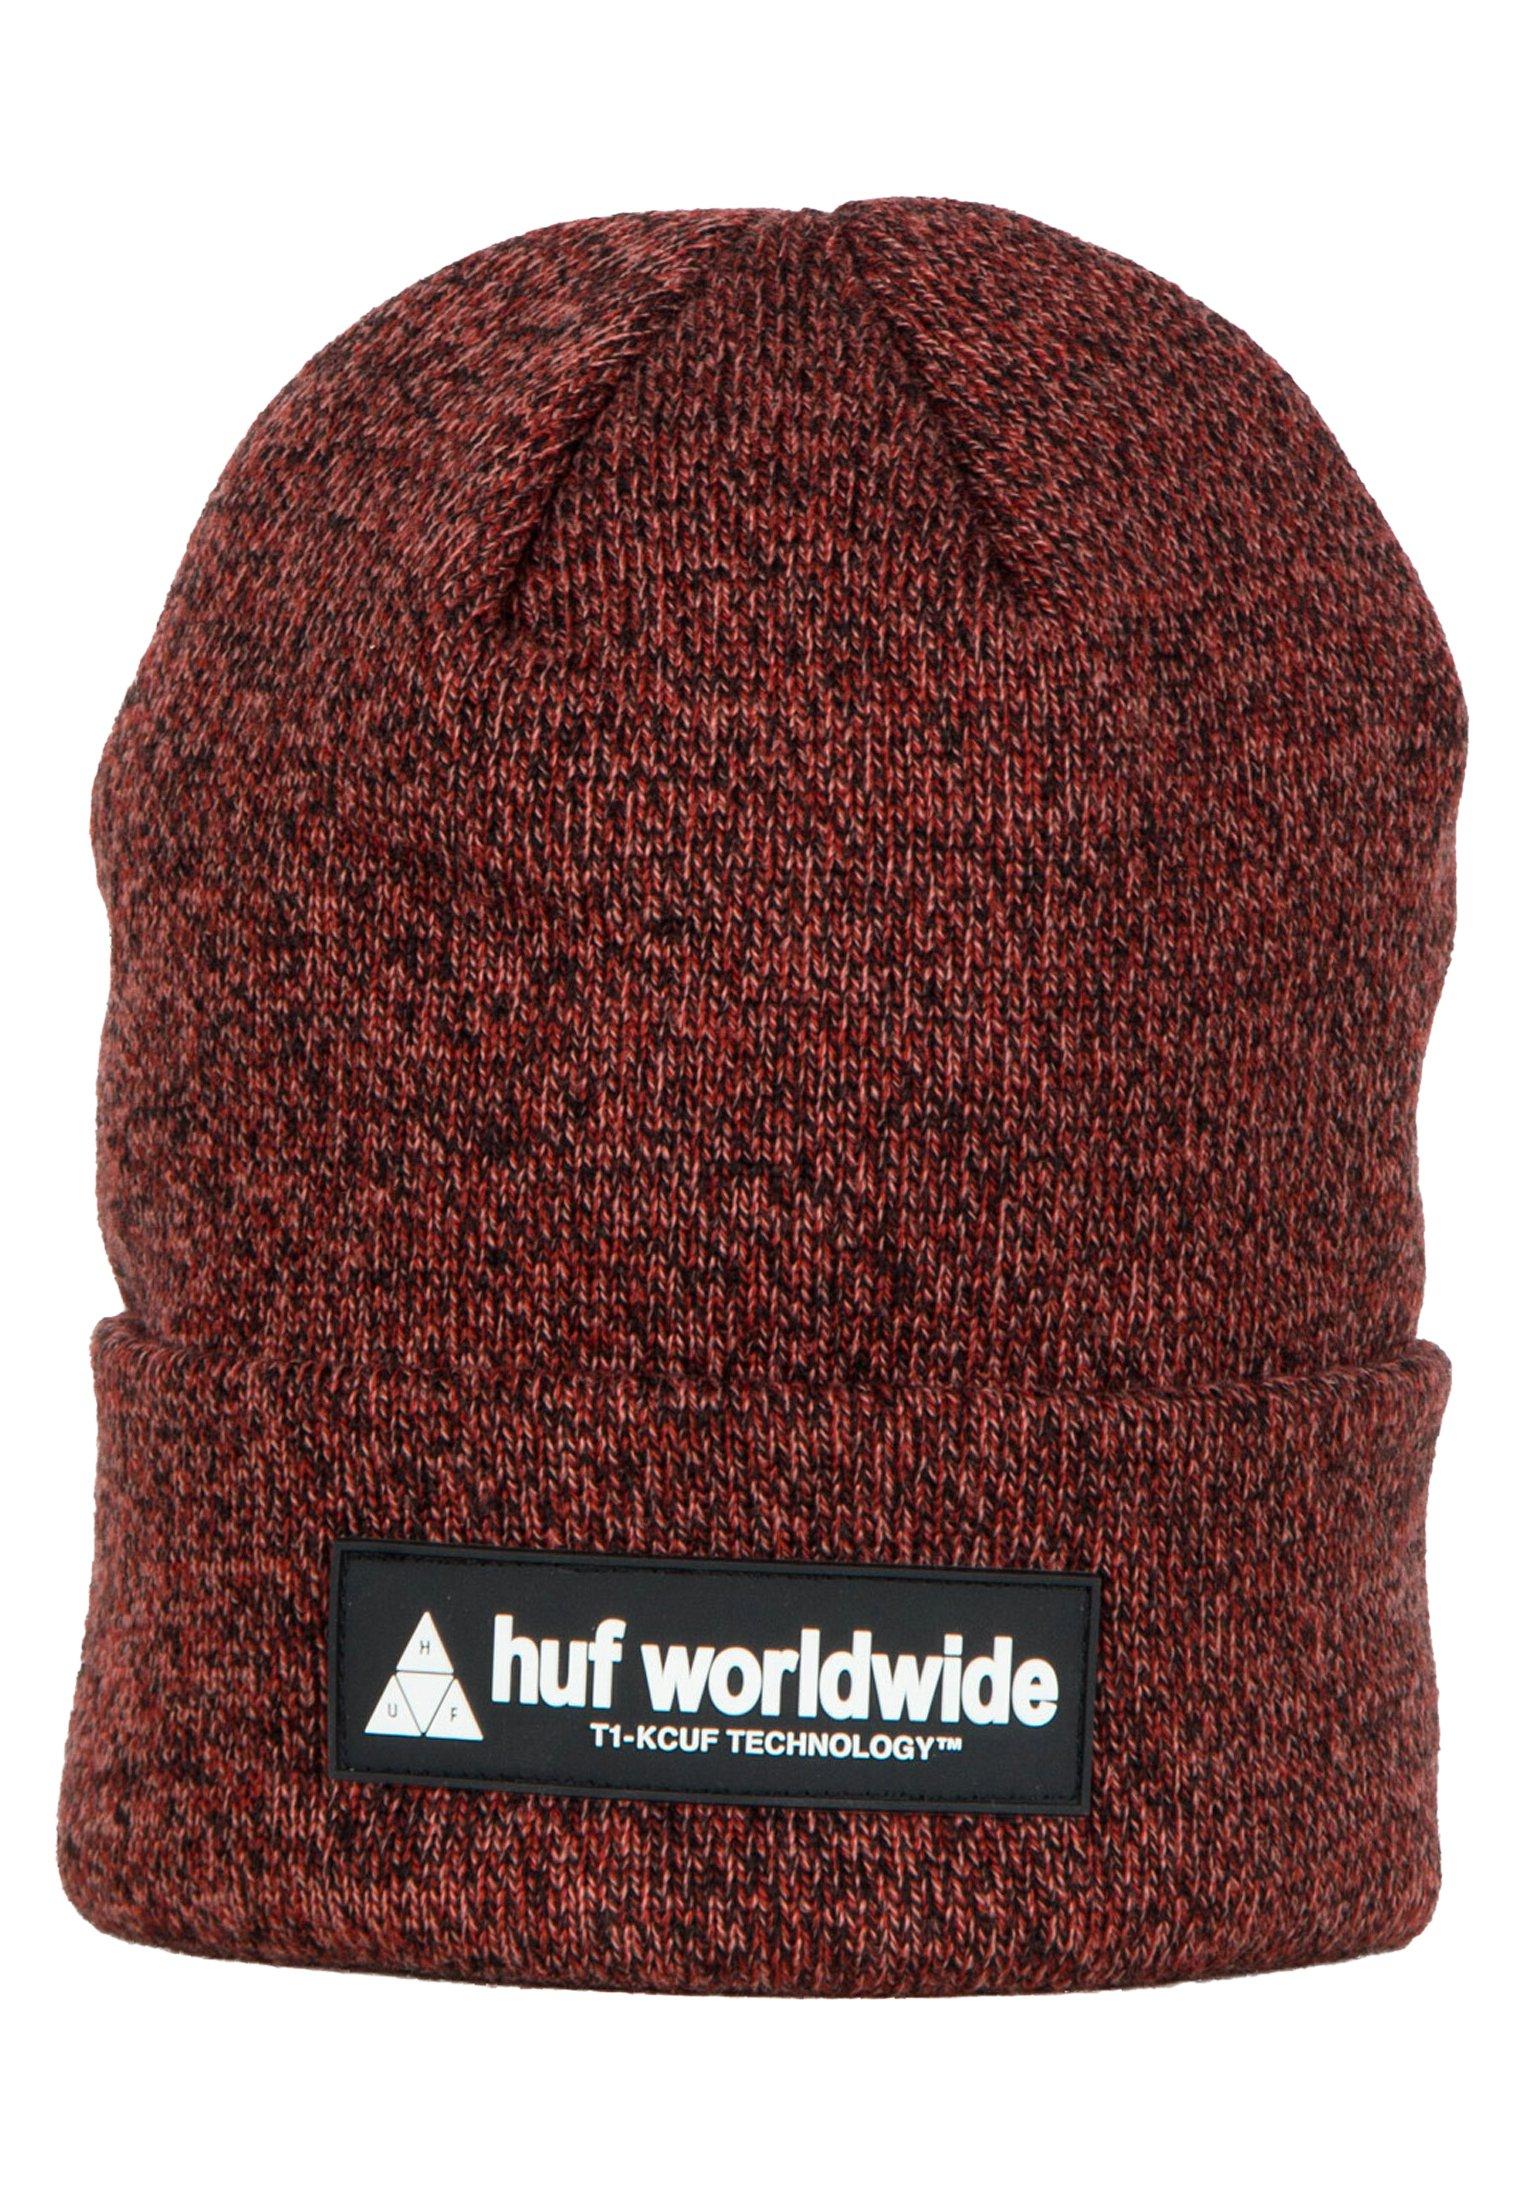 Huf Mütze - Rose Wood Red/rot-meliert